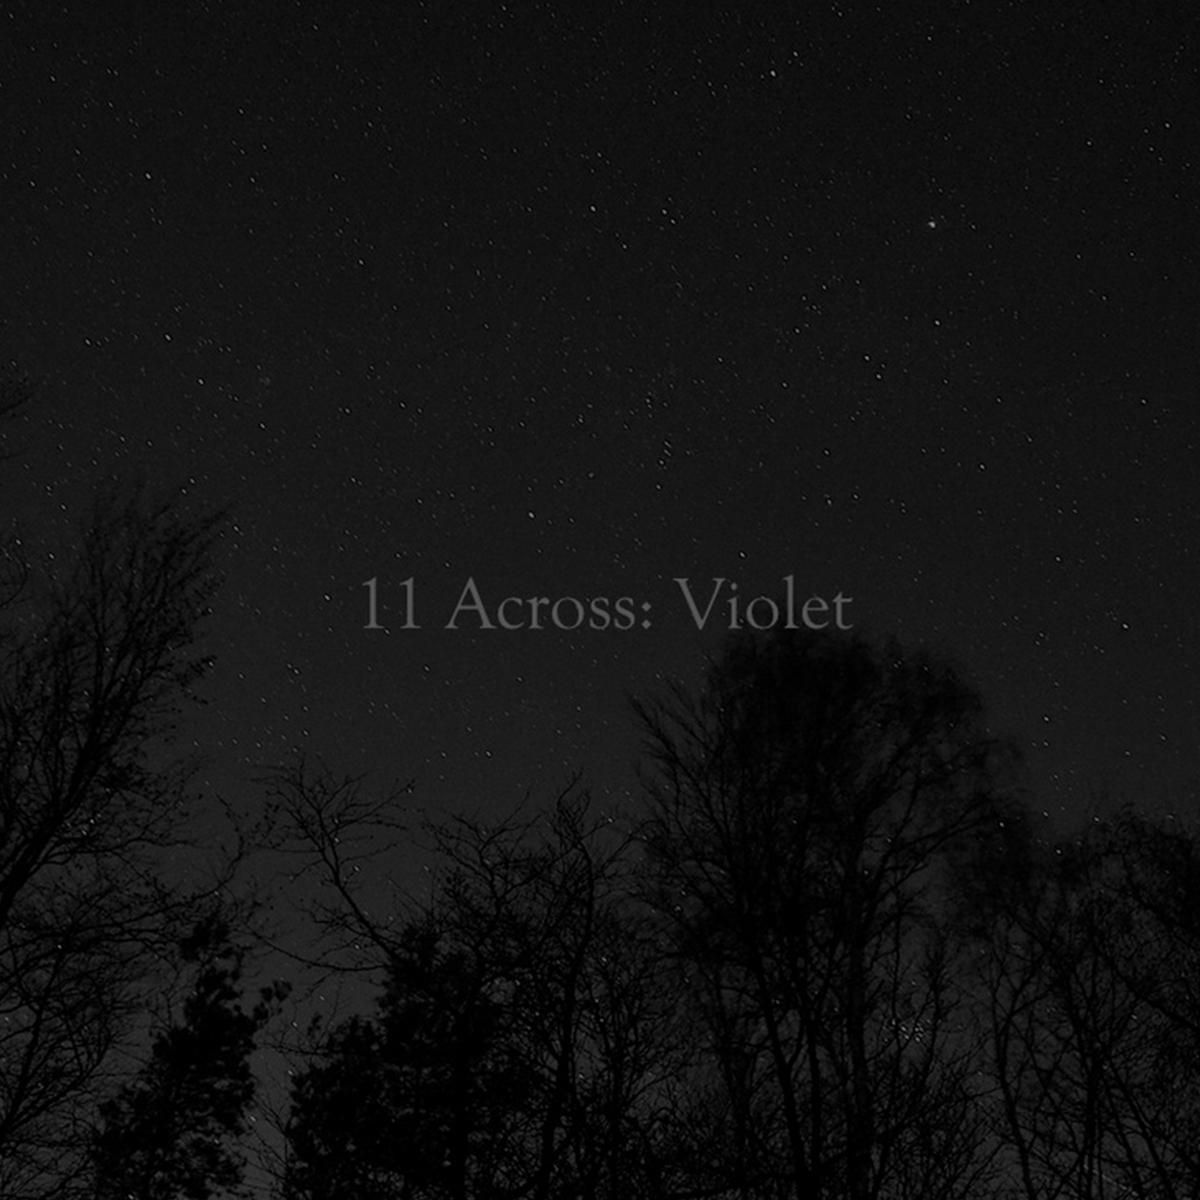 11 Across Violet